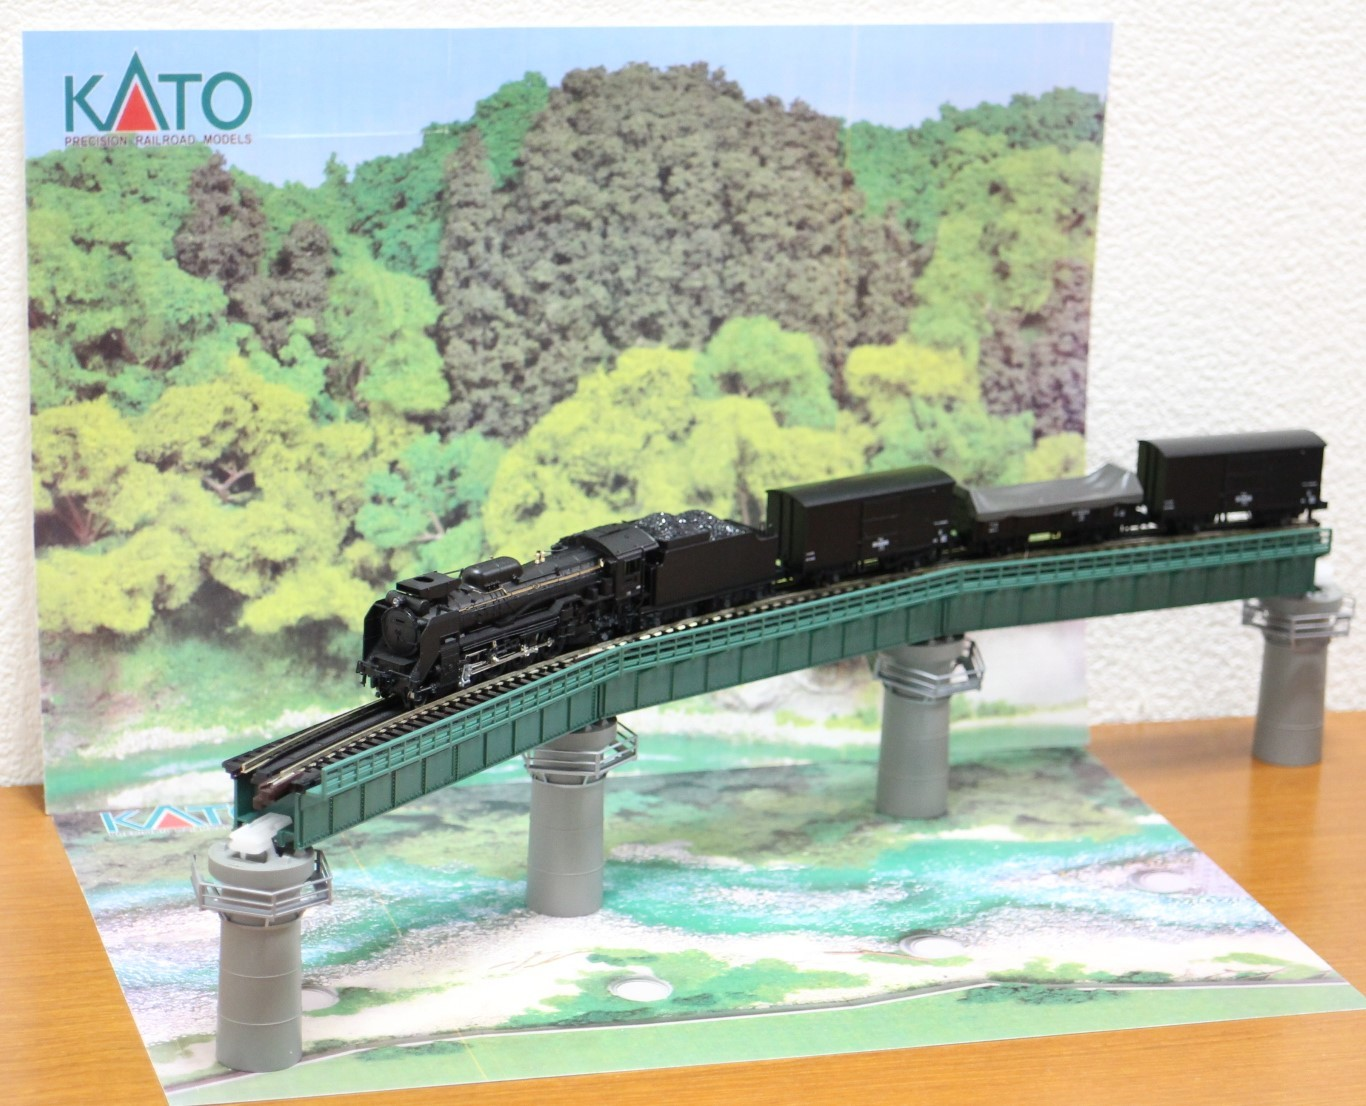 KATO のカーブ鉄橋セットを使い楽しんでみる!_a0149148_10195275.jpg